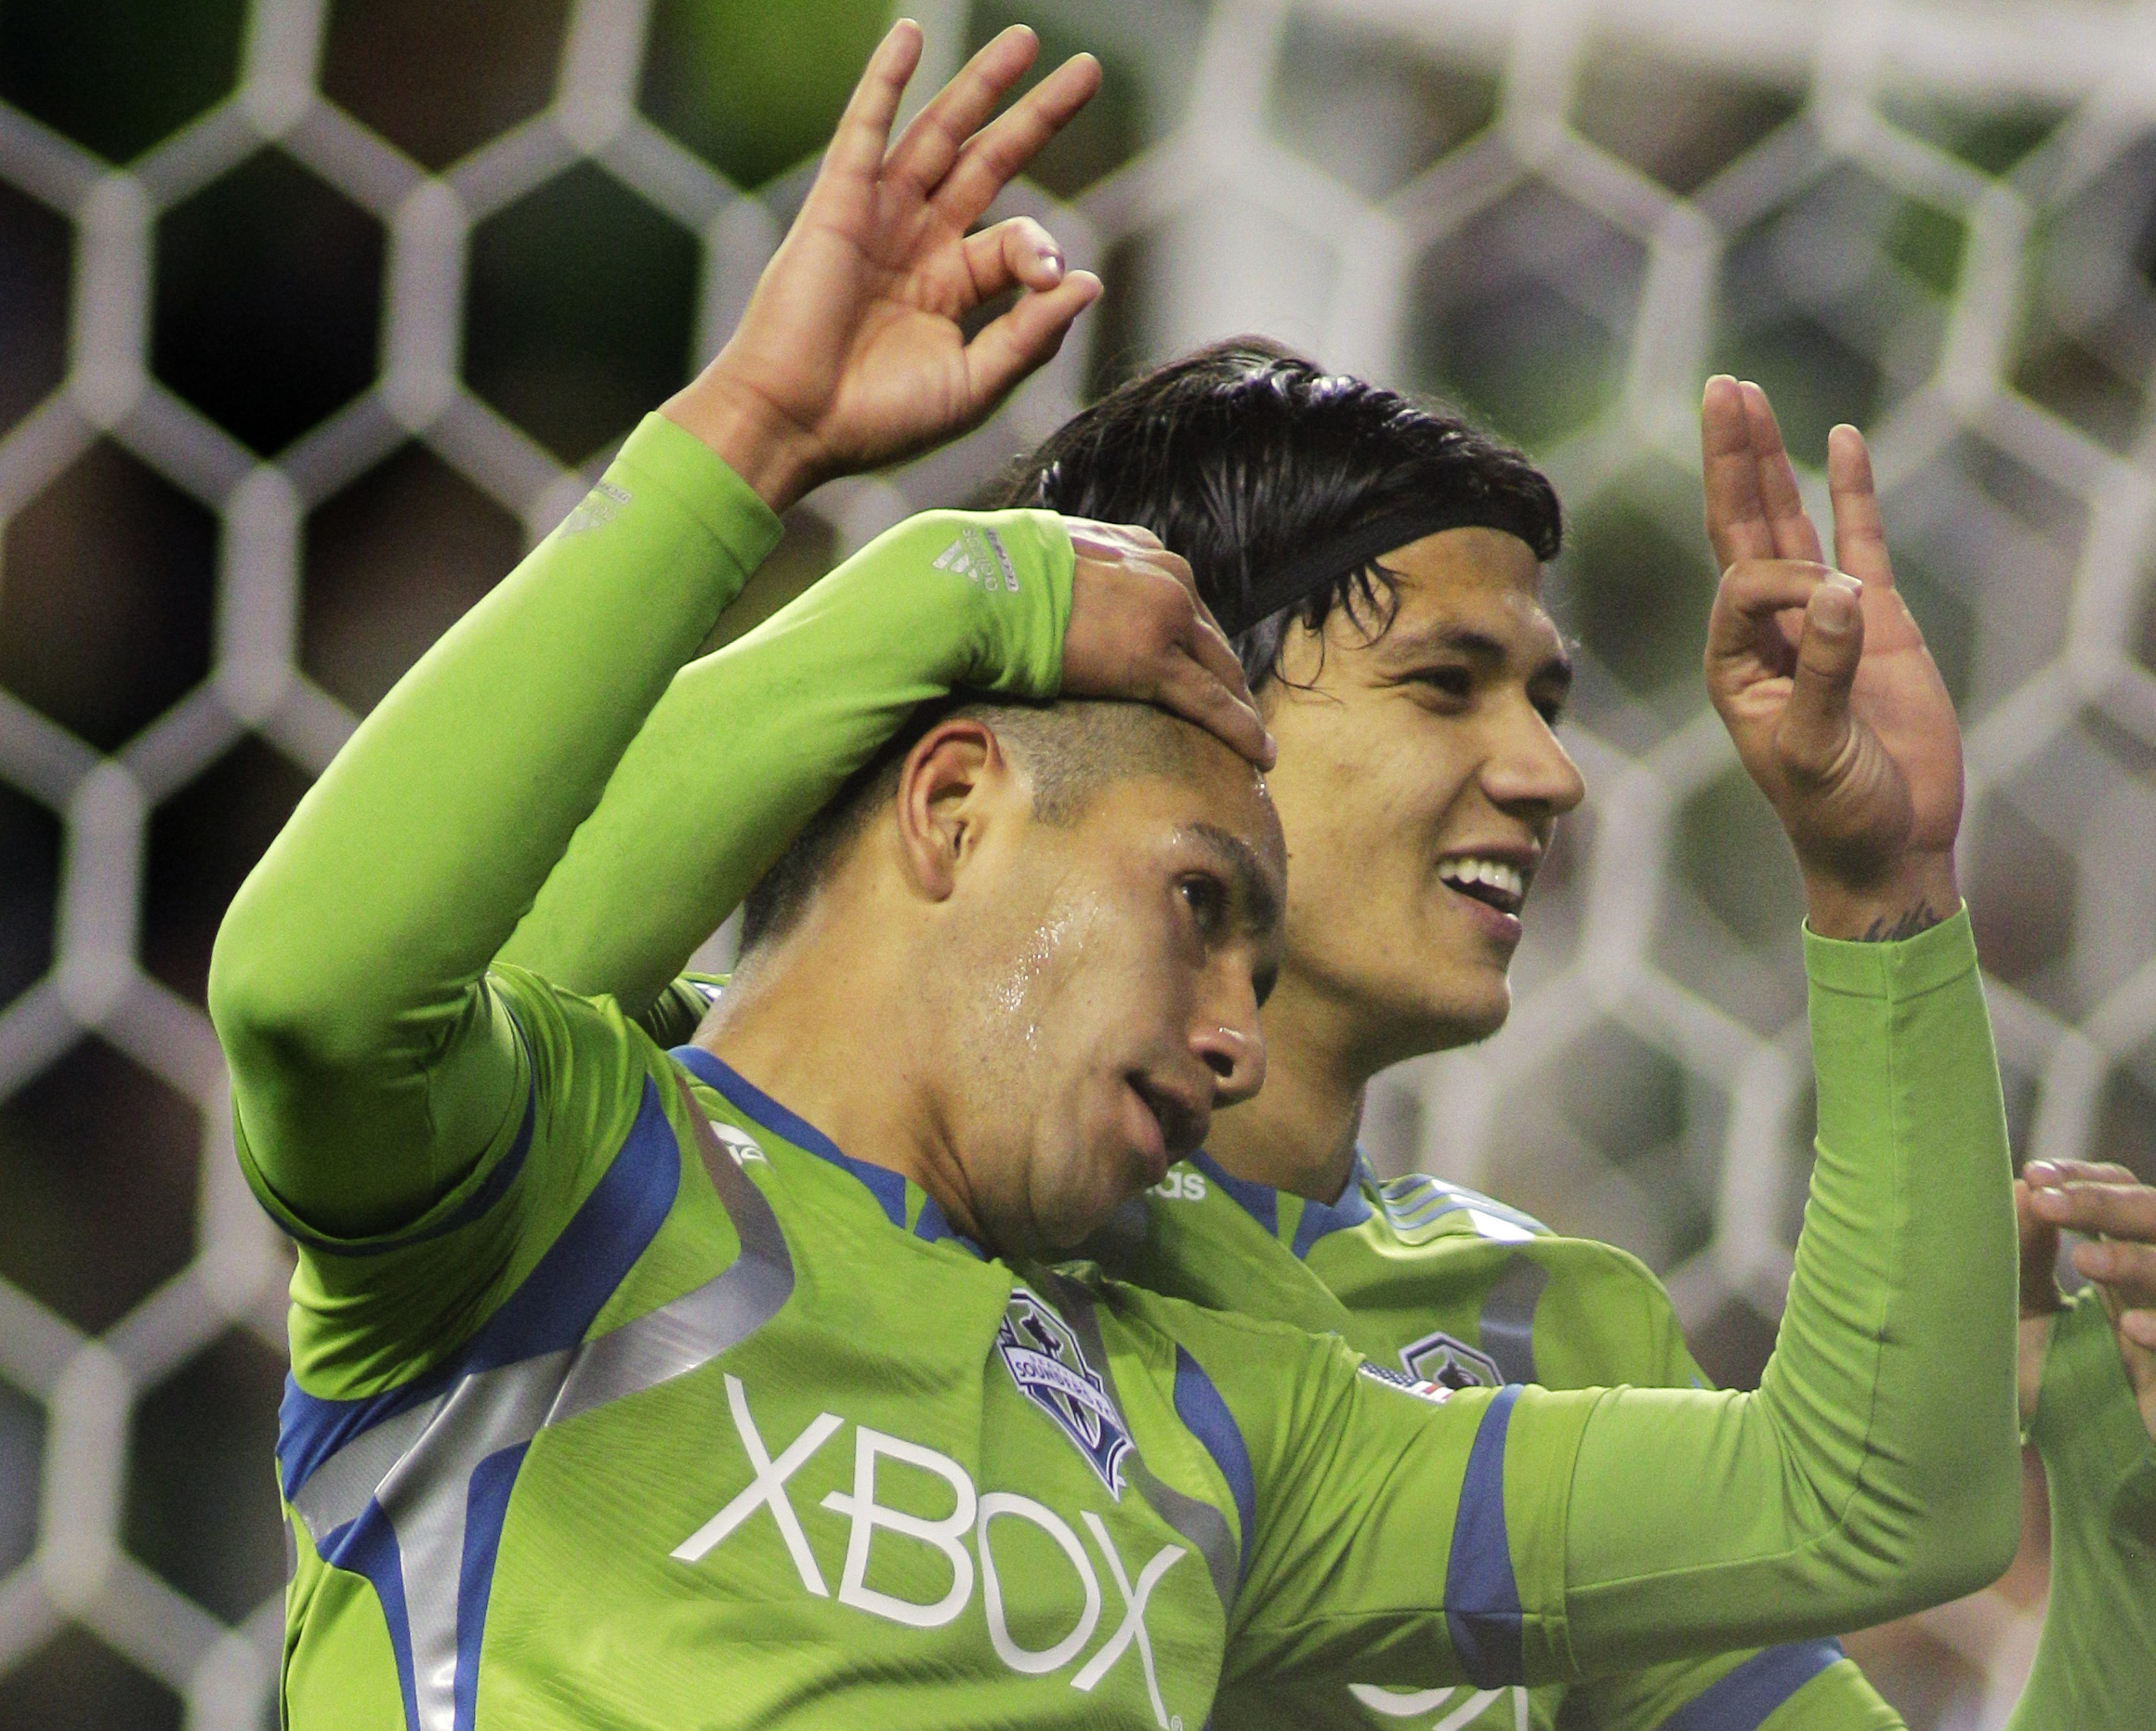 Estrada scores three goals in sounders opener the - David montero ...